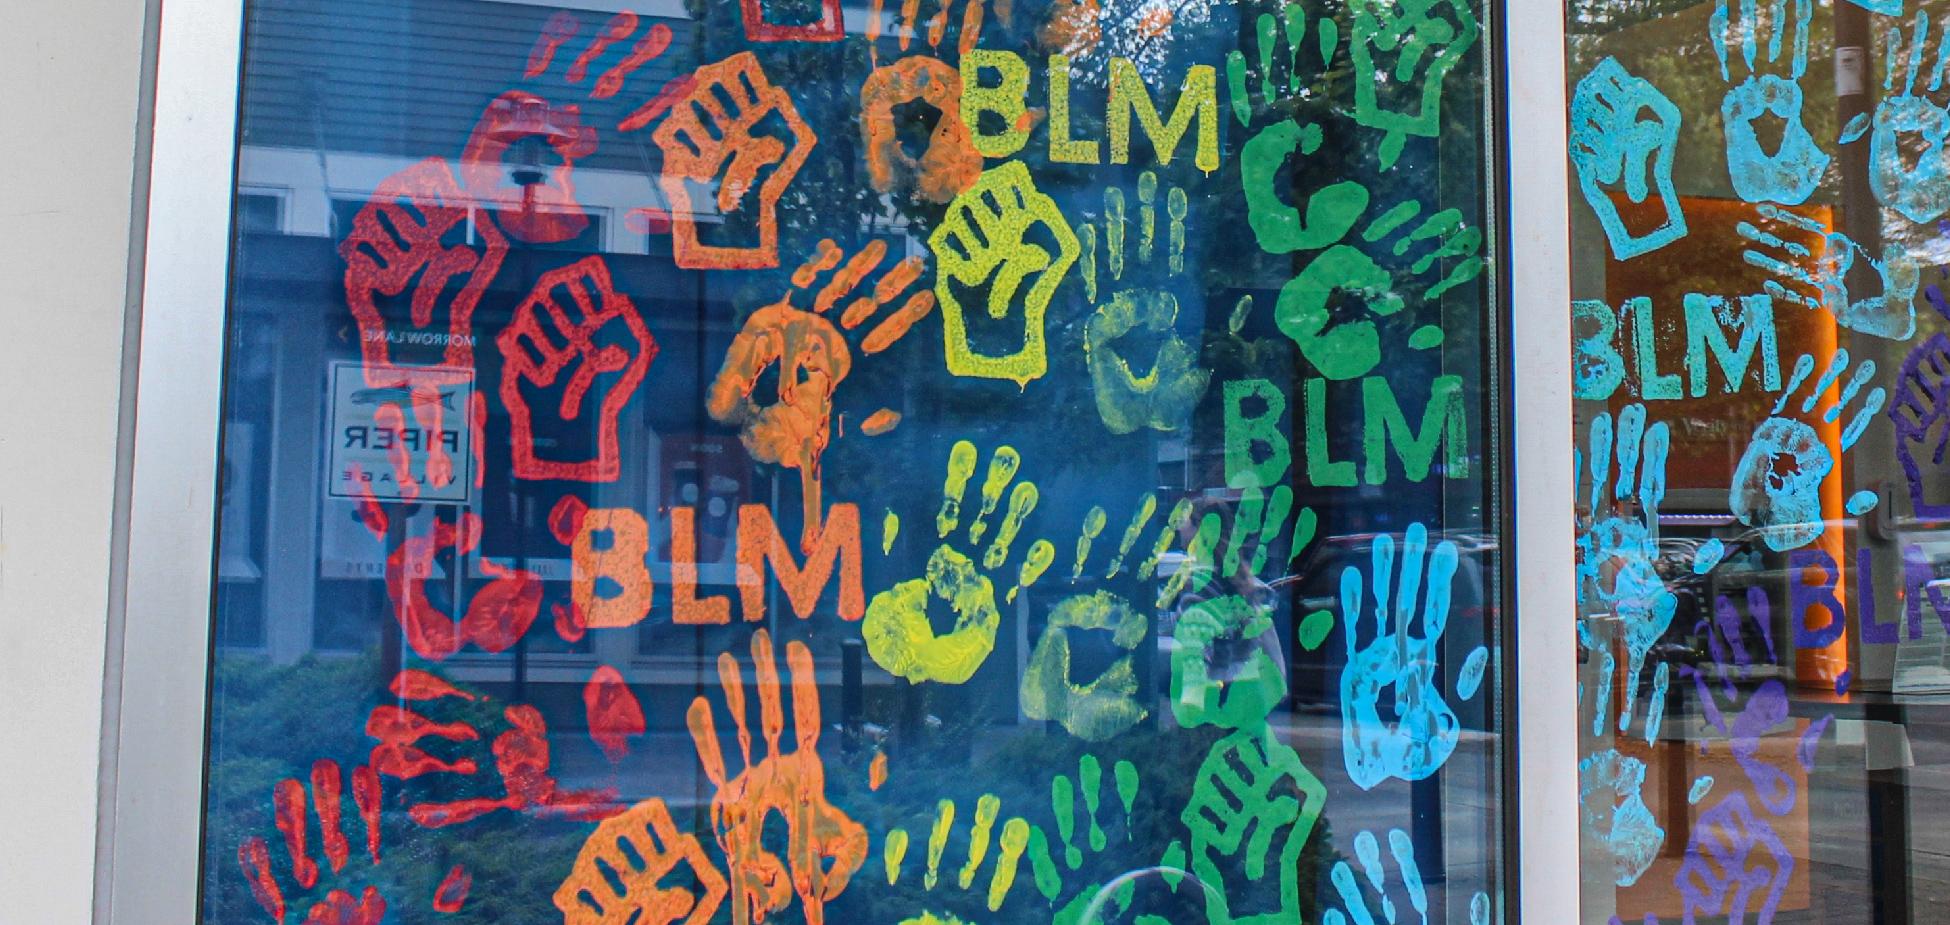 Greenwood branch window mural